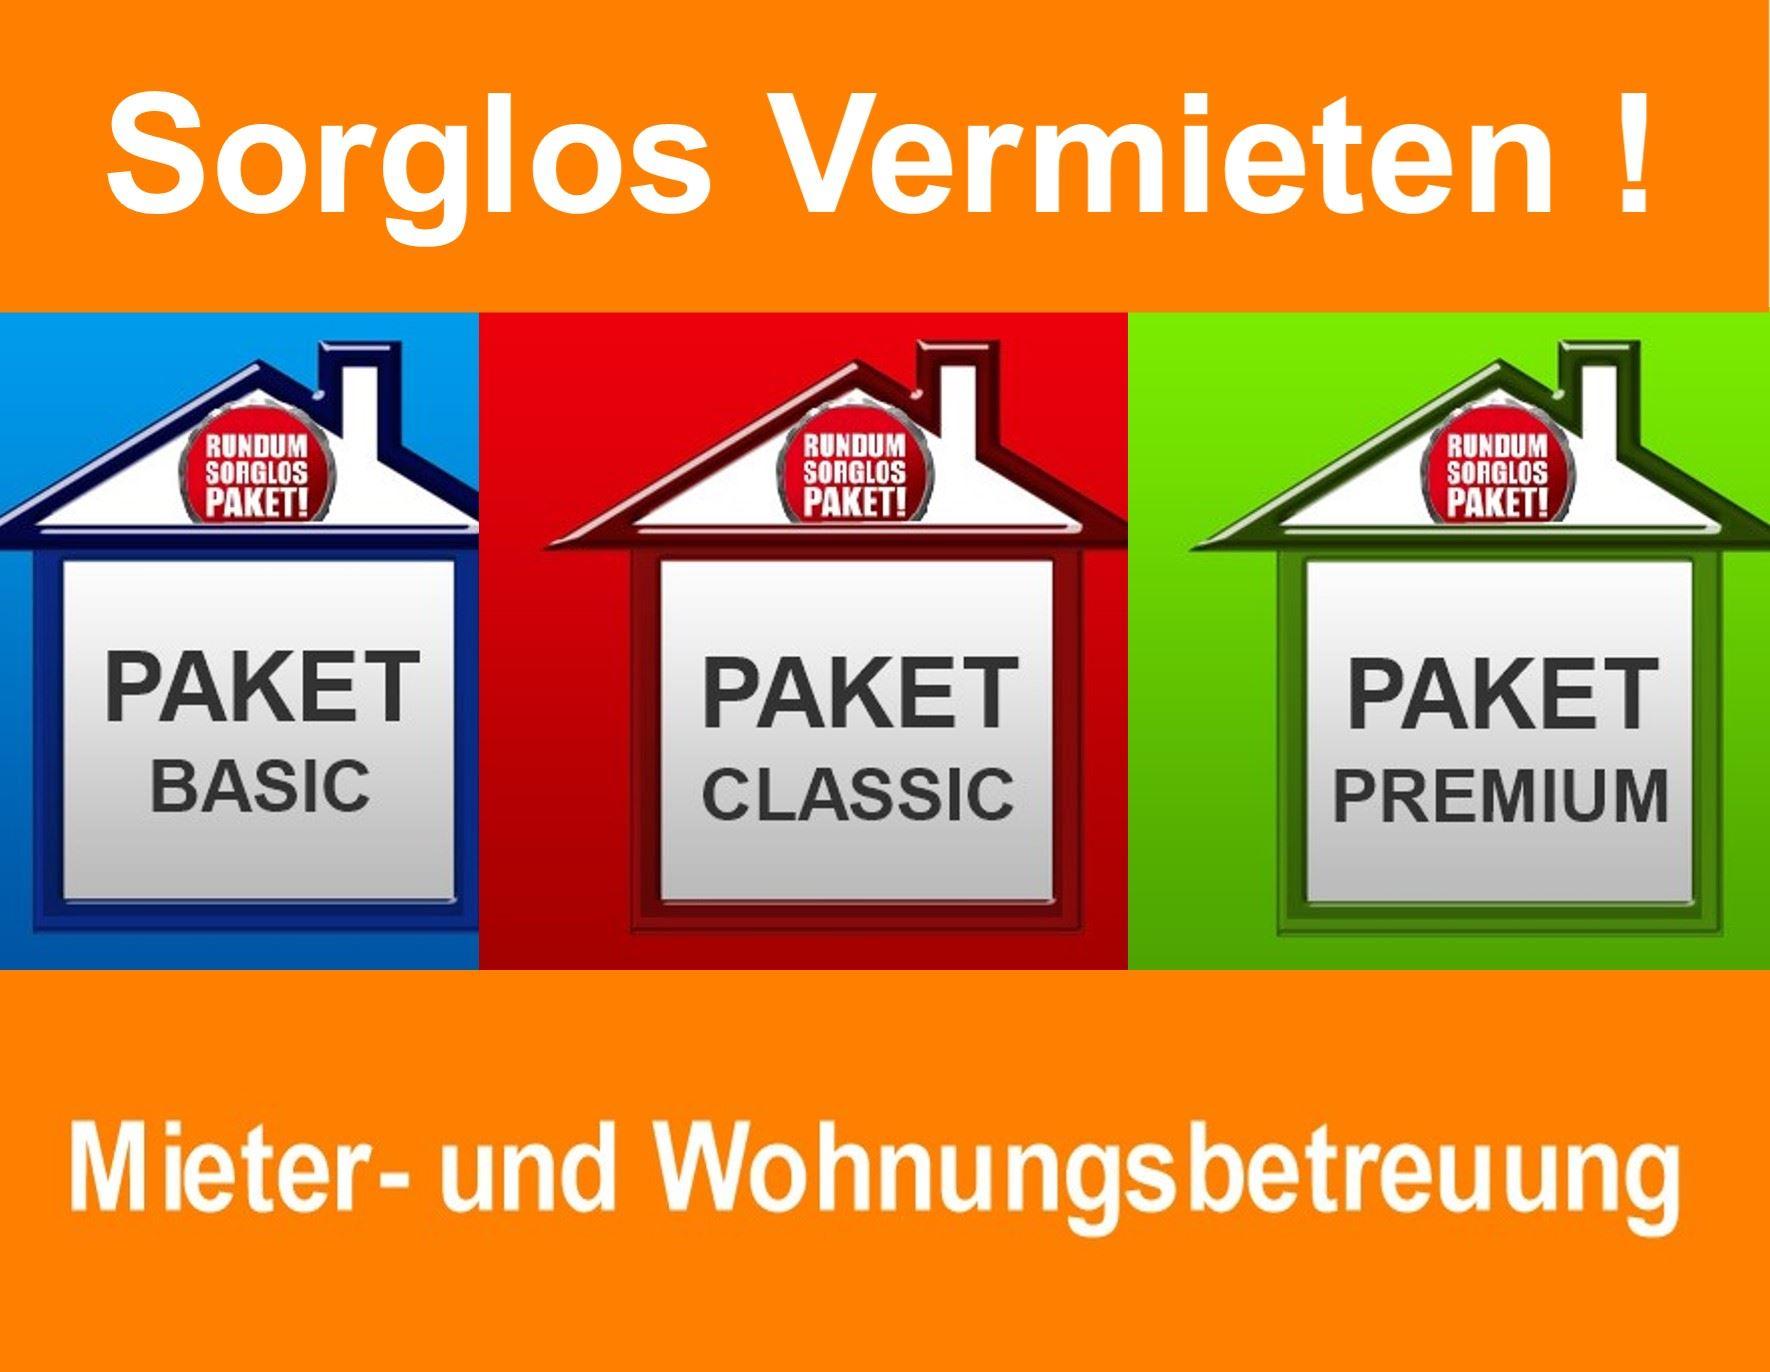 baroque immo group ihr immobilienmakler im landkreis ludwigsburg. Black Bedroom Furniture Sets. Home Design Ideas